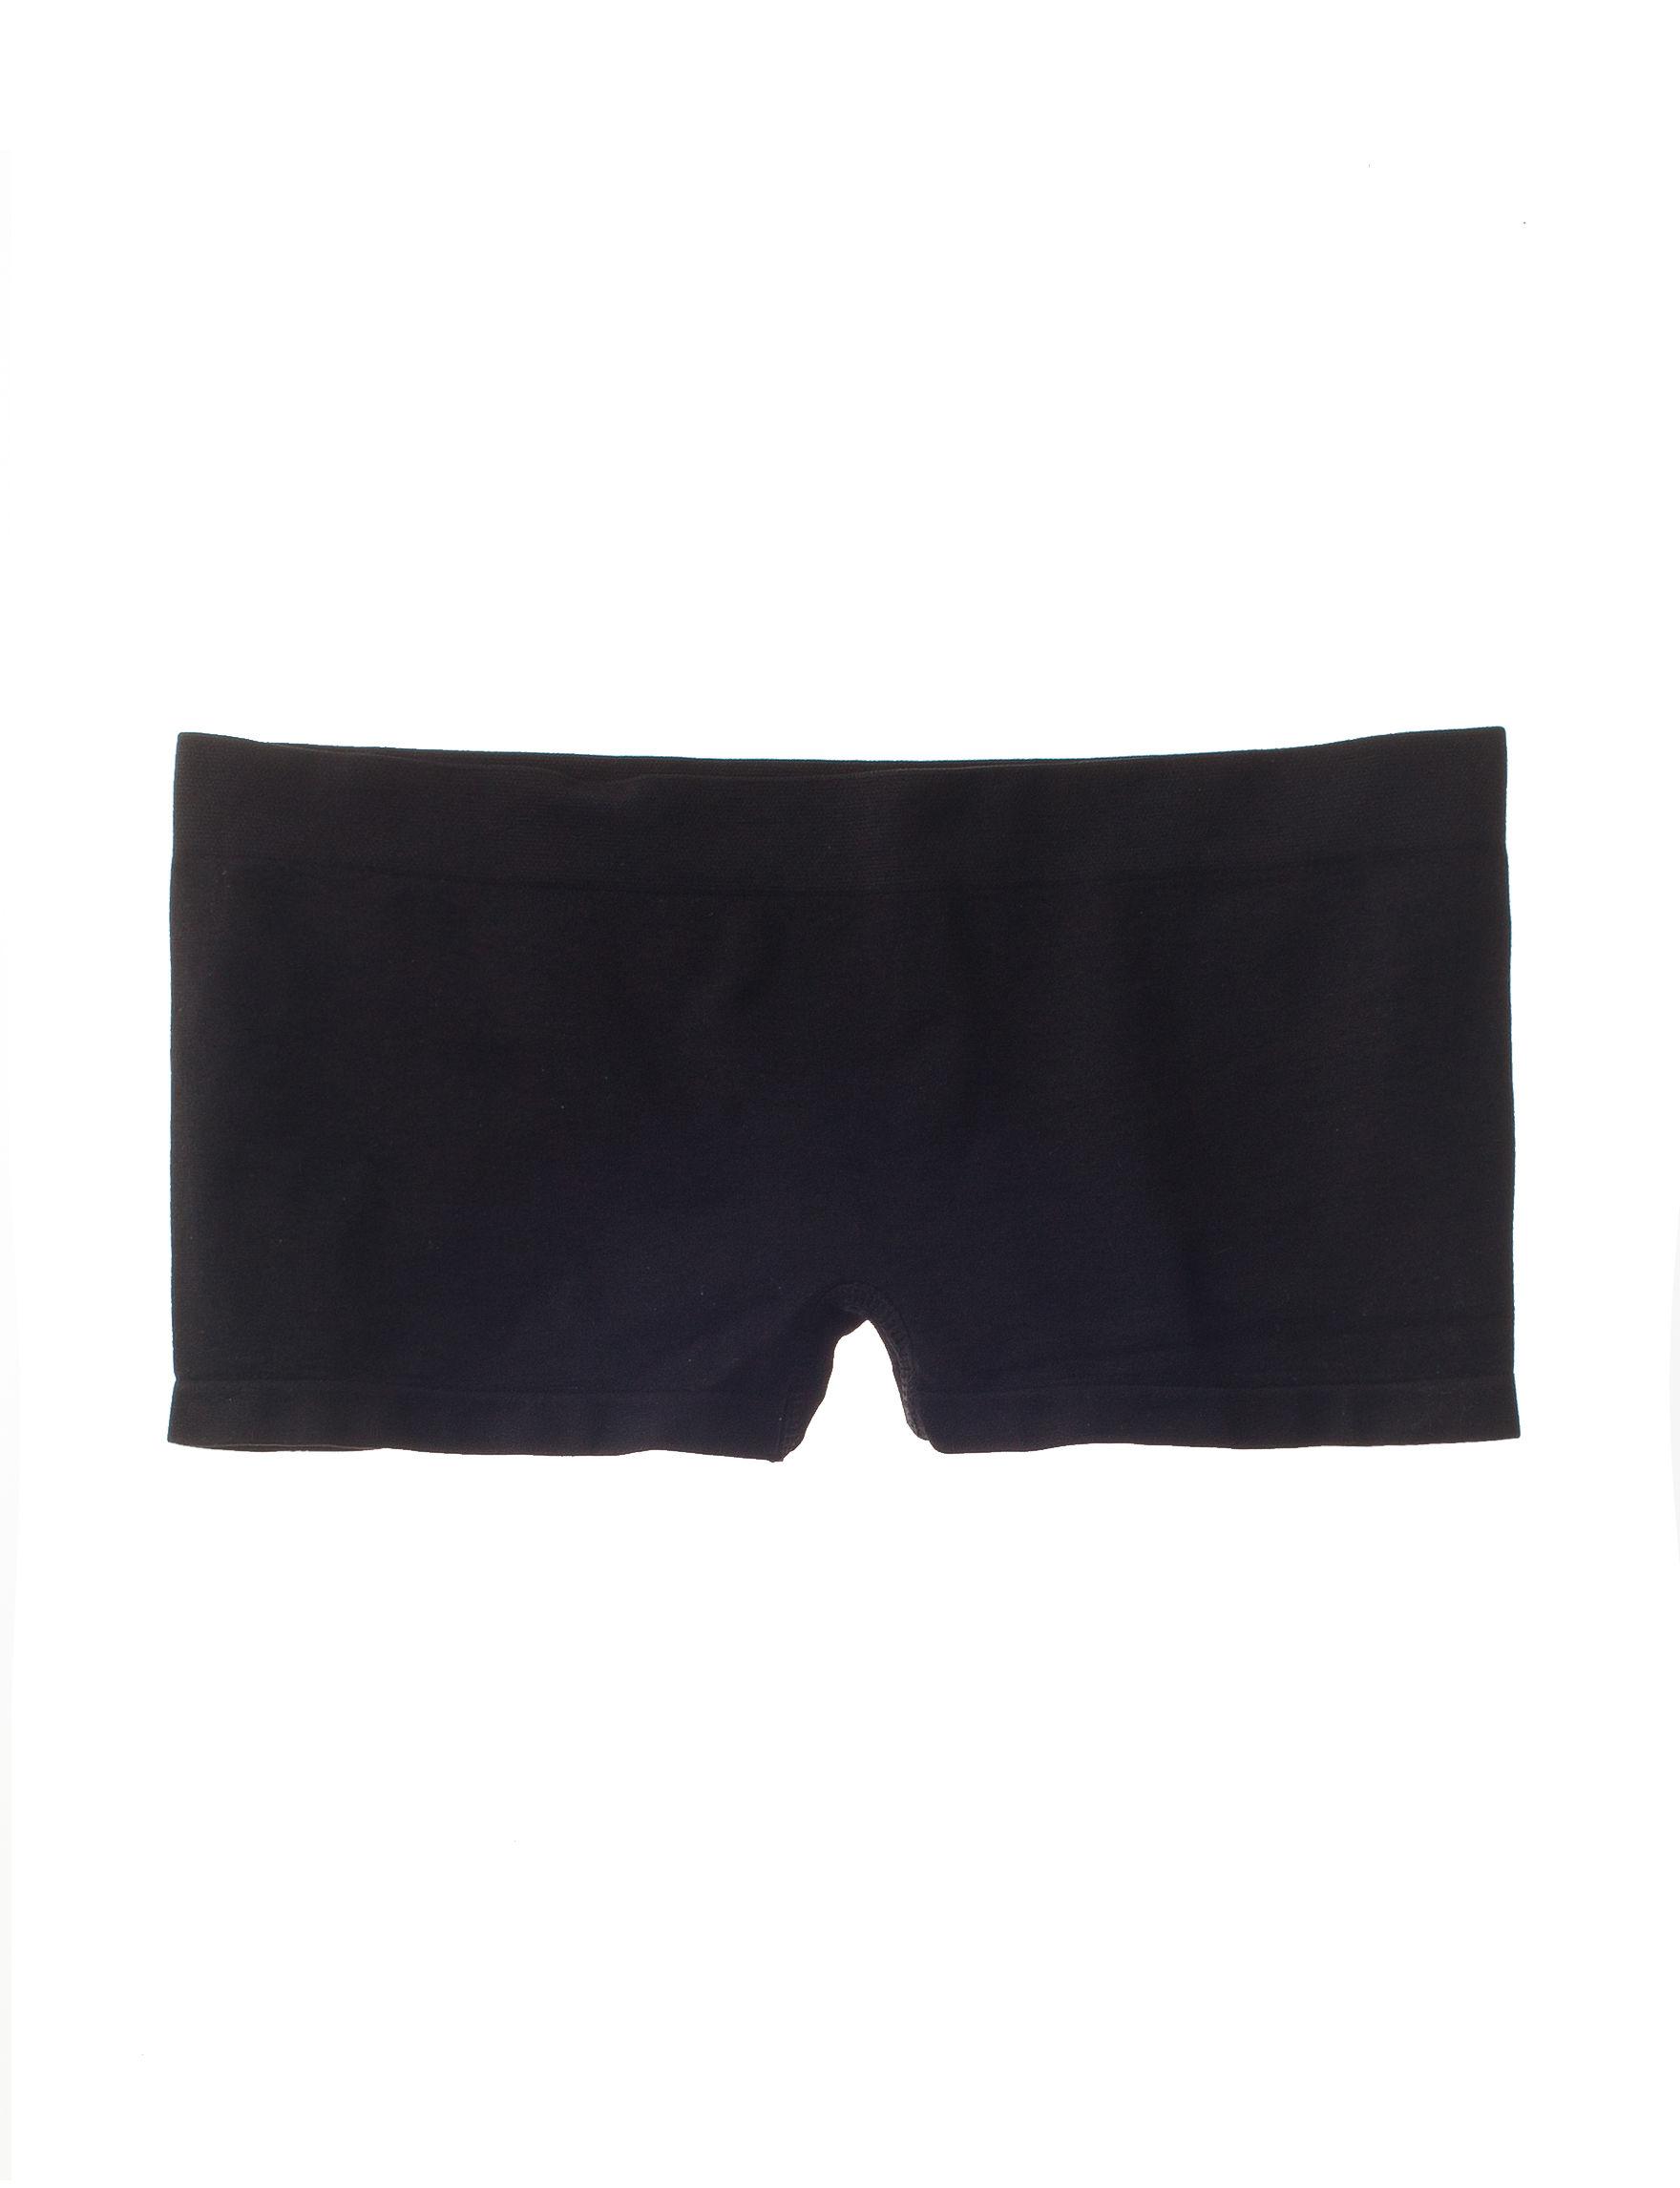 B Intimates Black Panties Boyshort